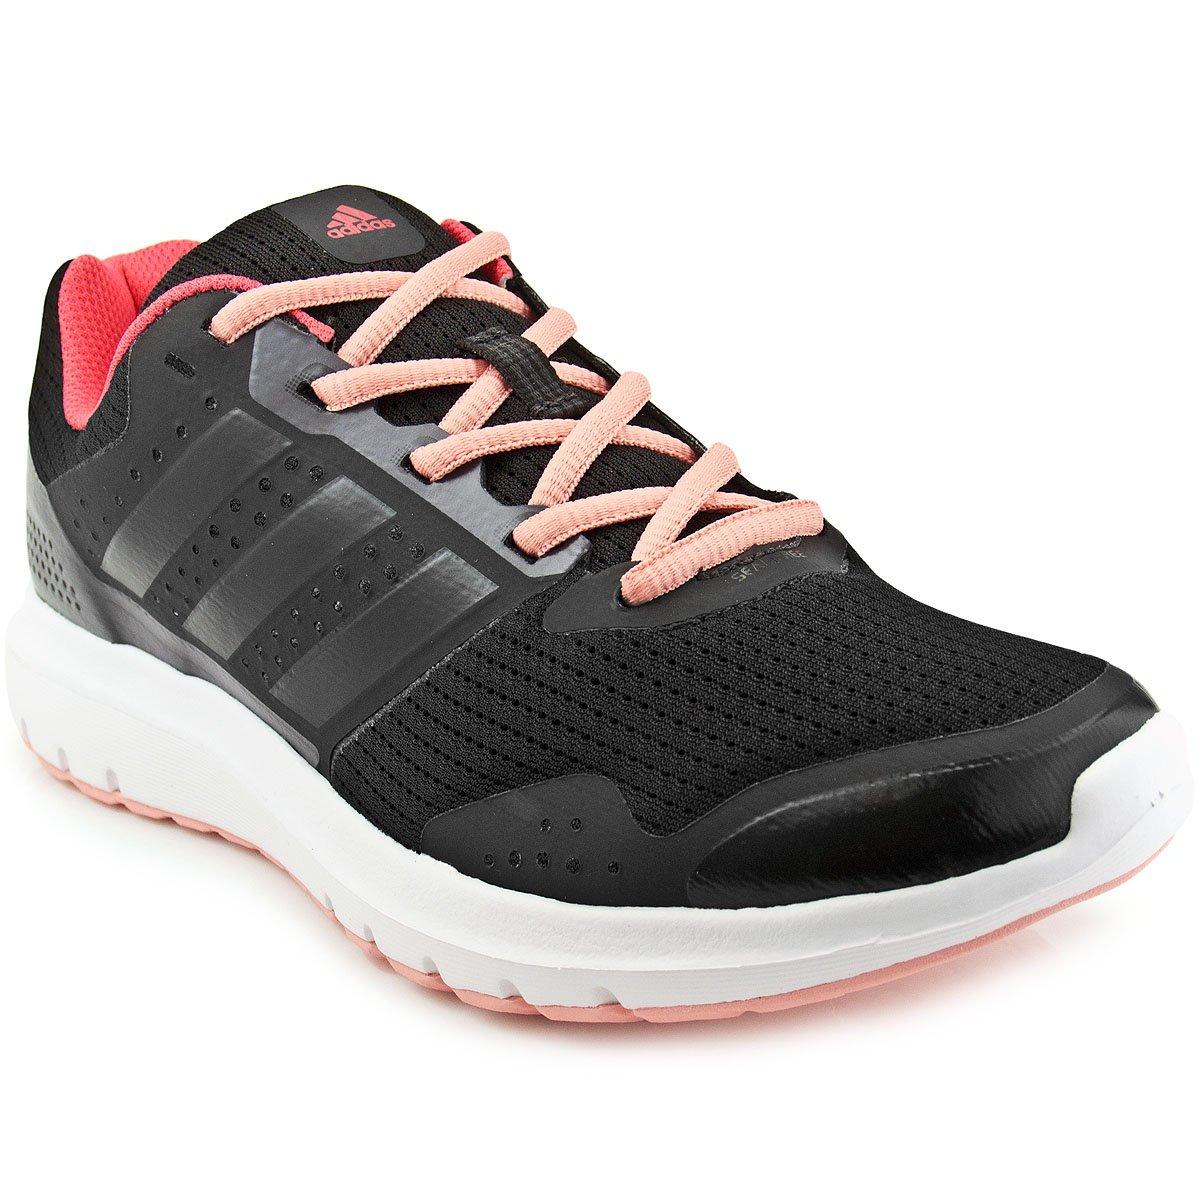 Tênis Adidas Duramo 7 W  97ce2540cb0d6